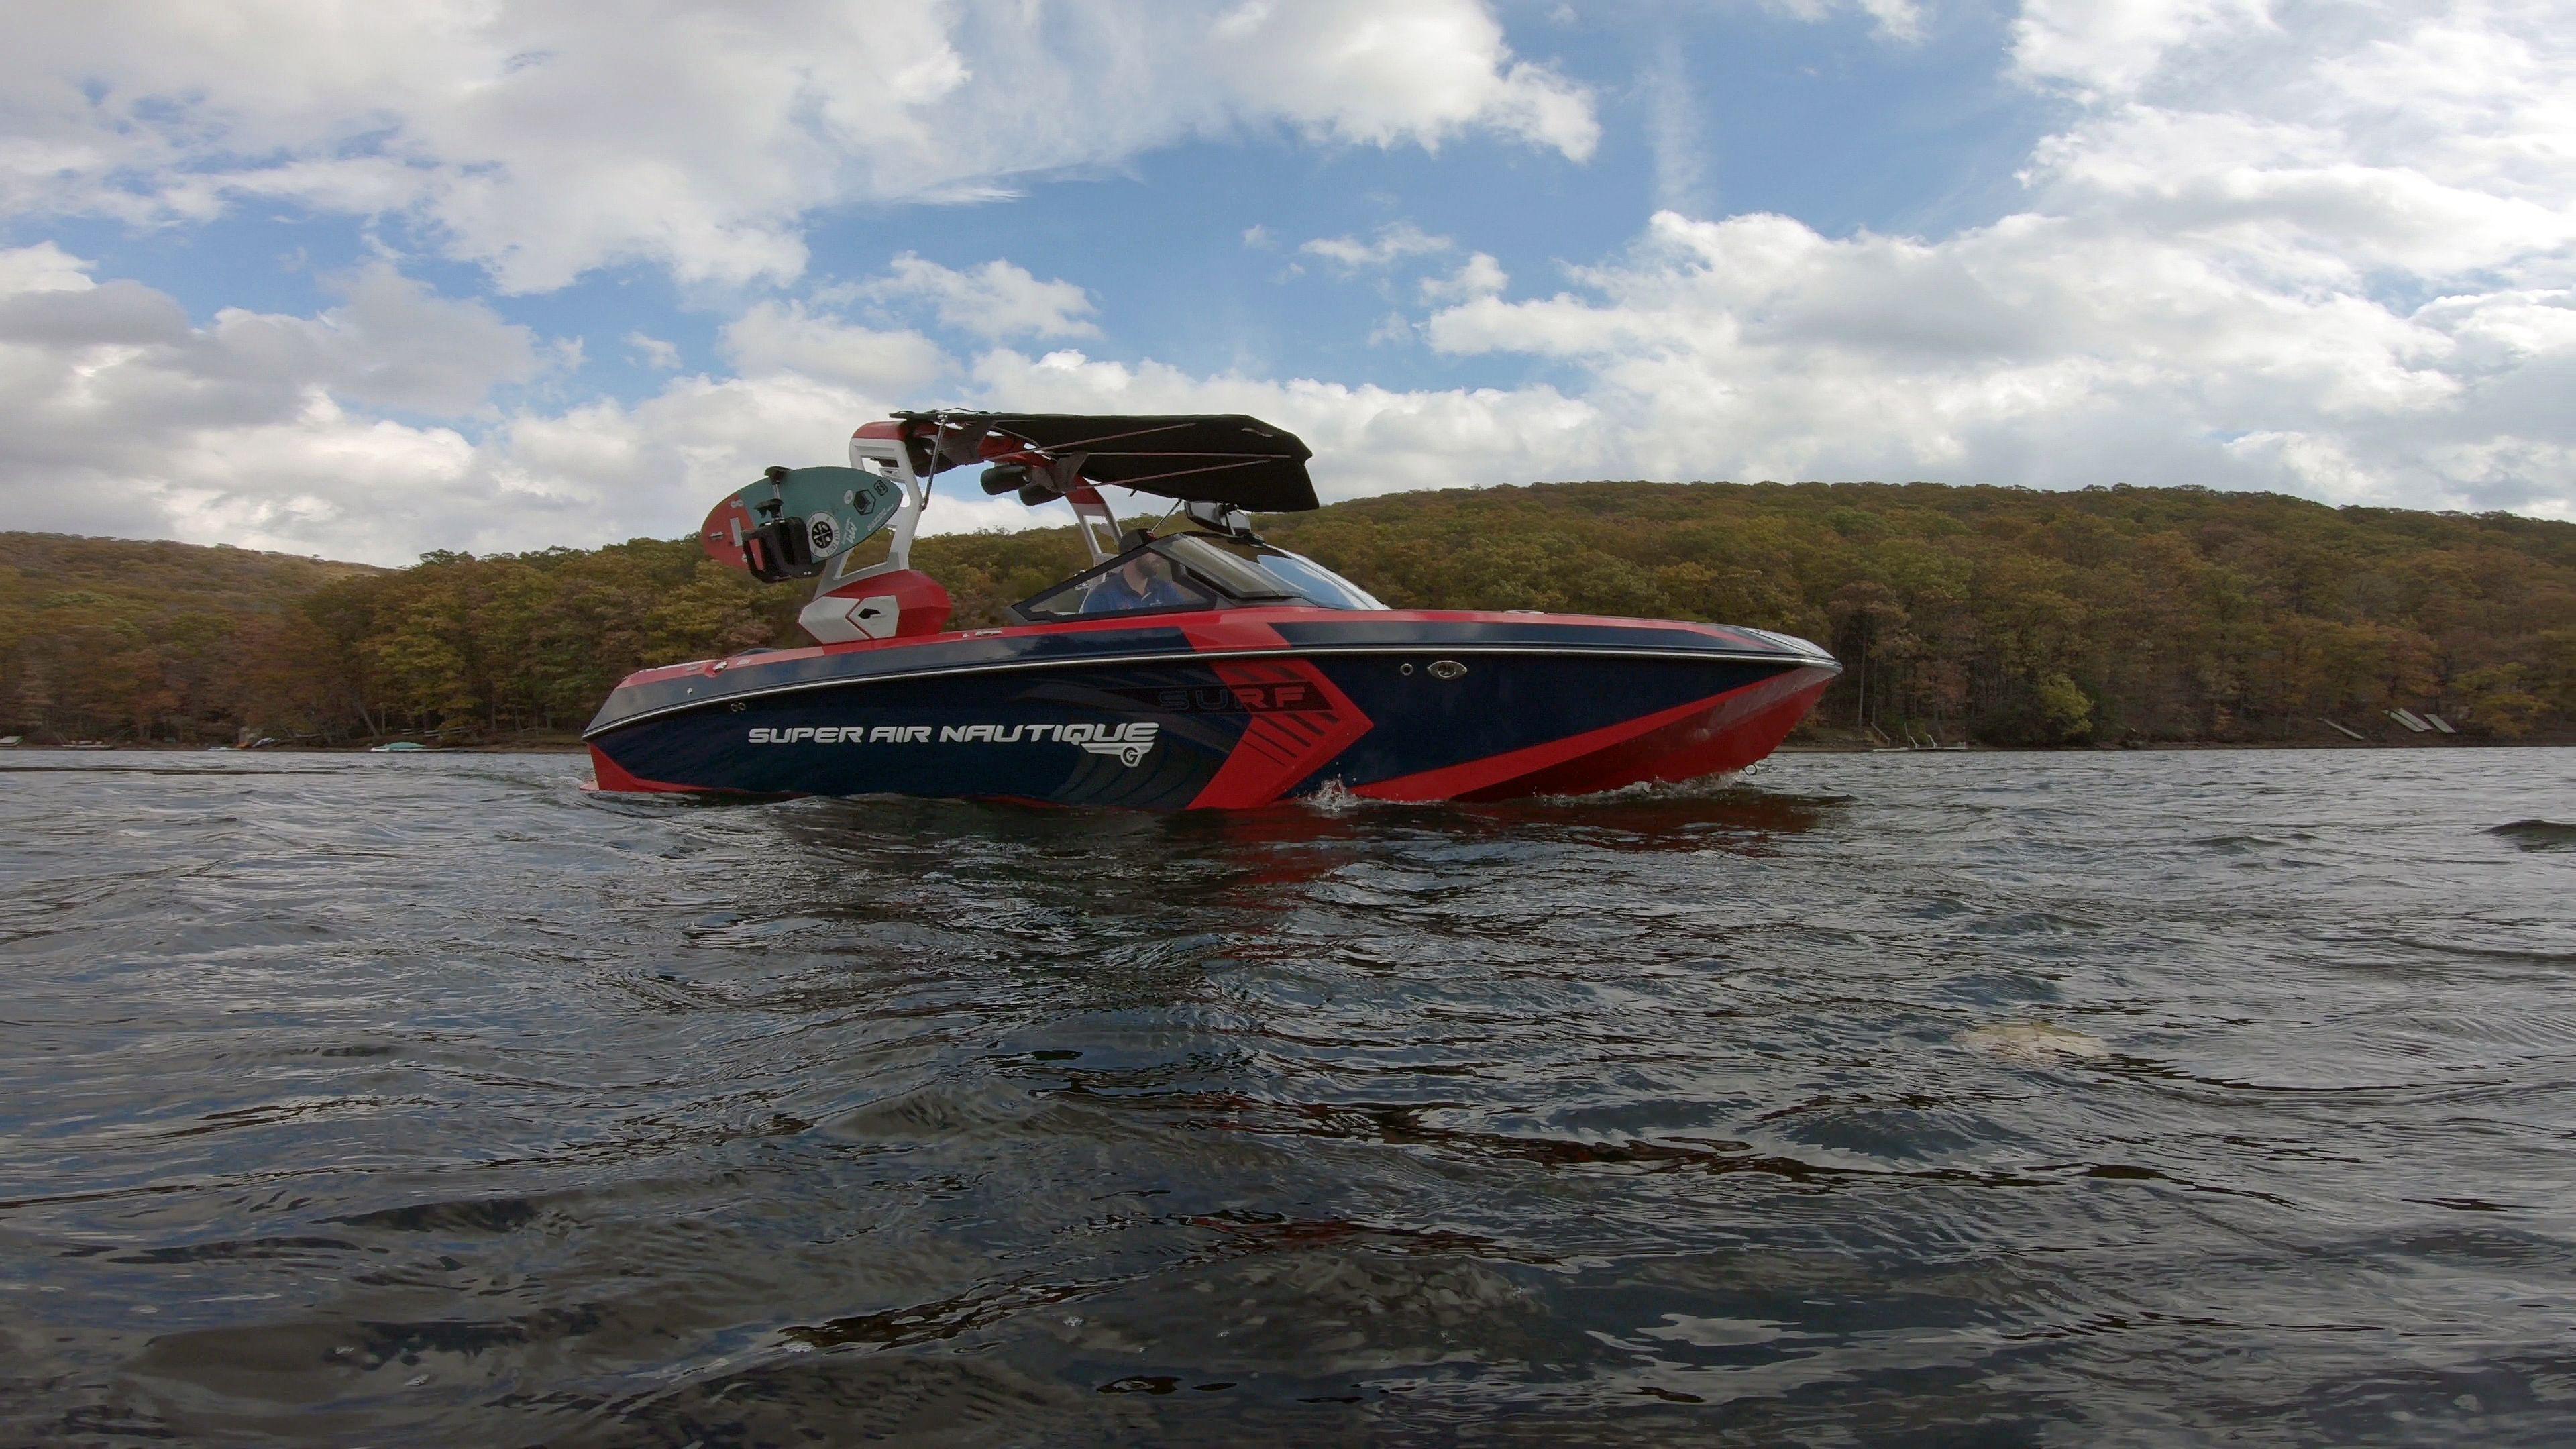 2019 Nautique G23 in Cherry Creek Cove Deep creek lake, Boat